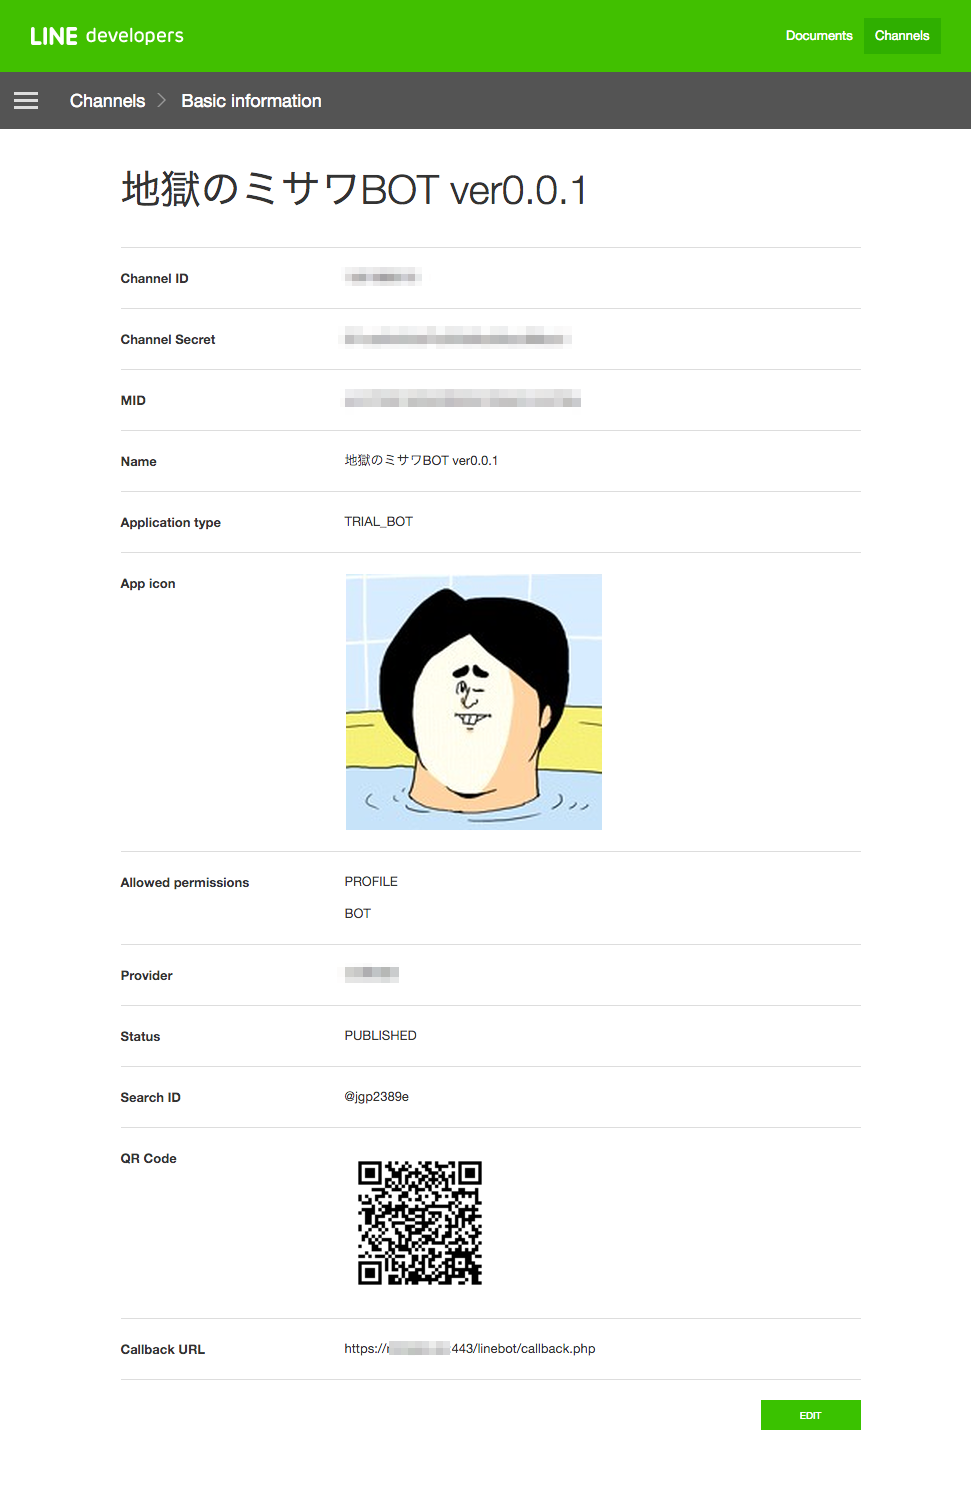 screencapture-developers-line-me-channels-1461989310-1460054506047.png